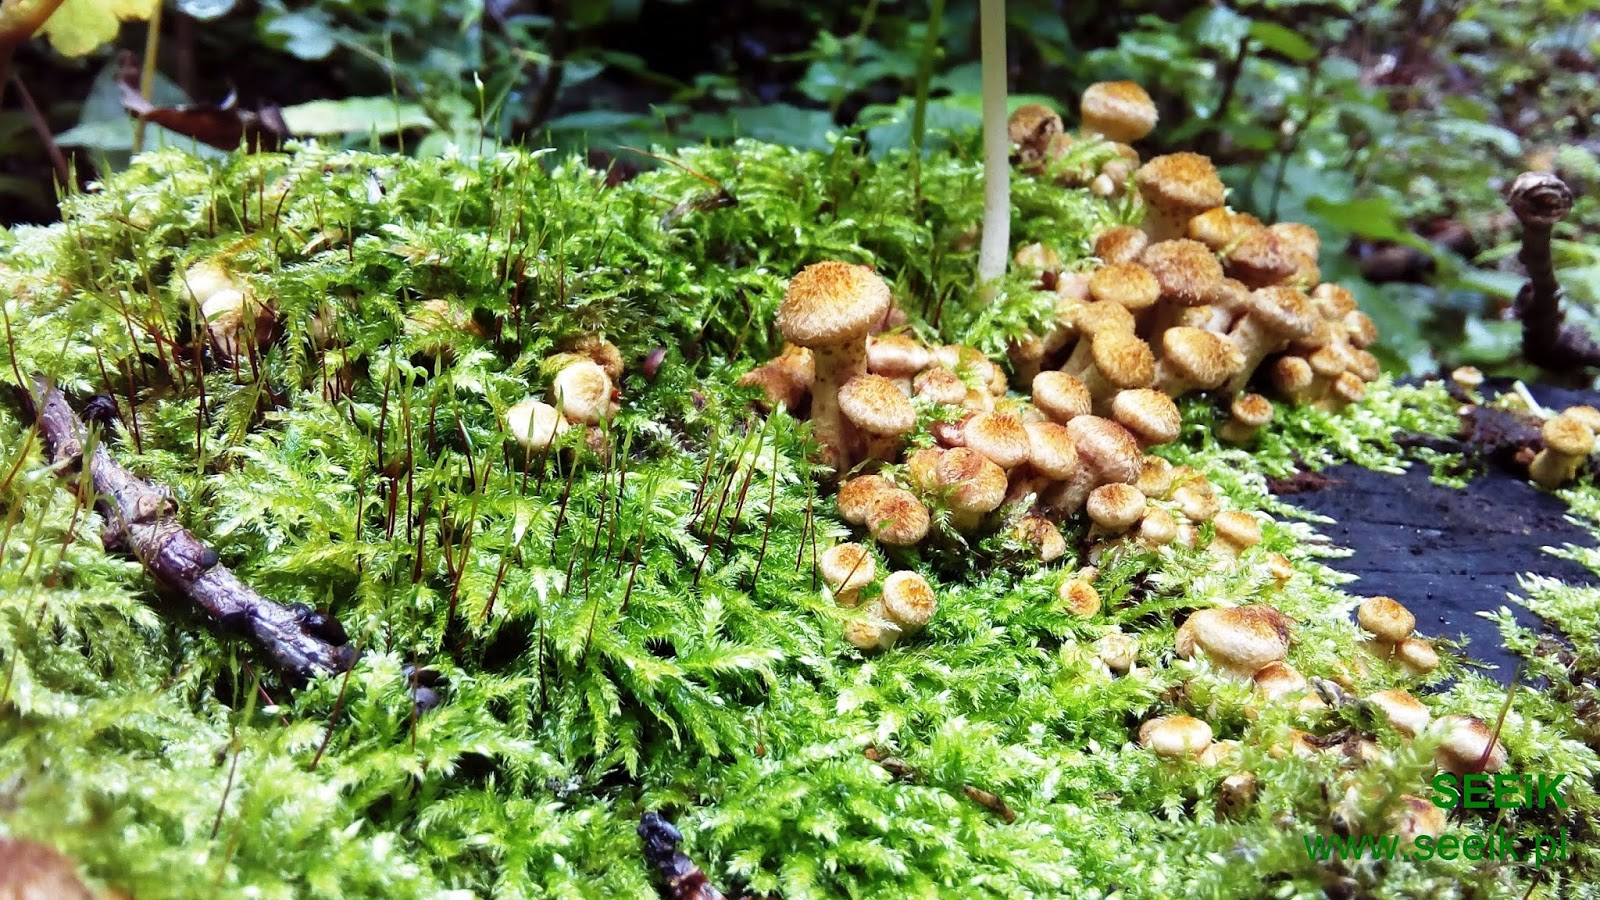 Mushrooms from Masuria woods